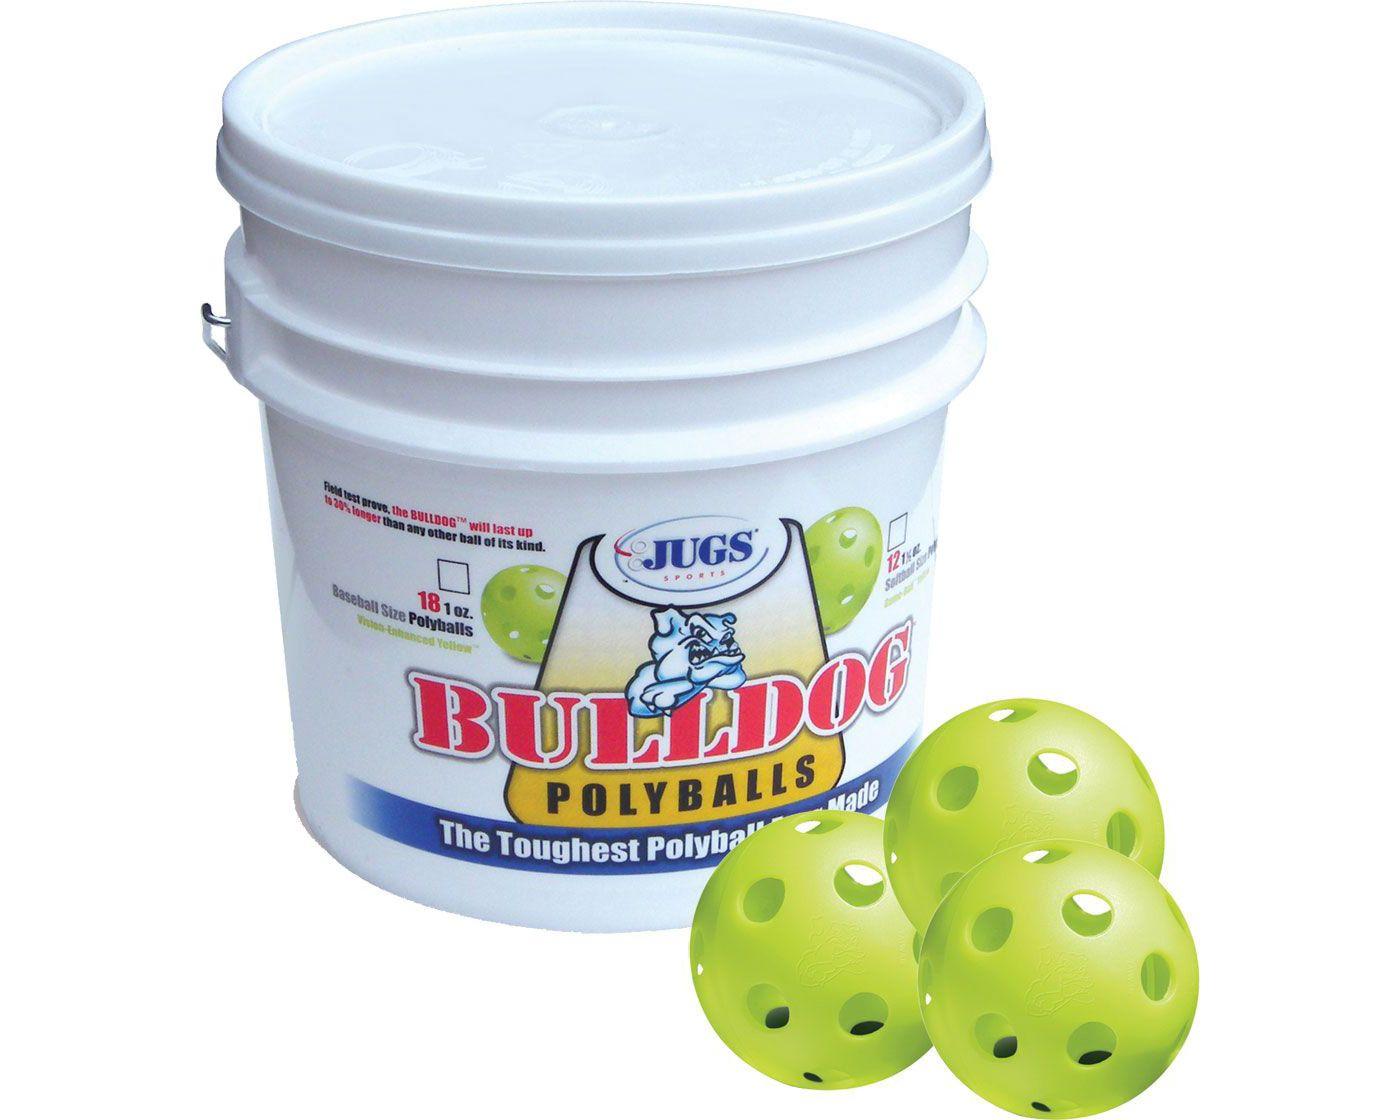 Jugs Bulldog Yellow Poly Training Softballs - Bucket of 12